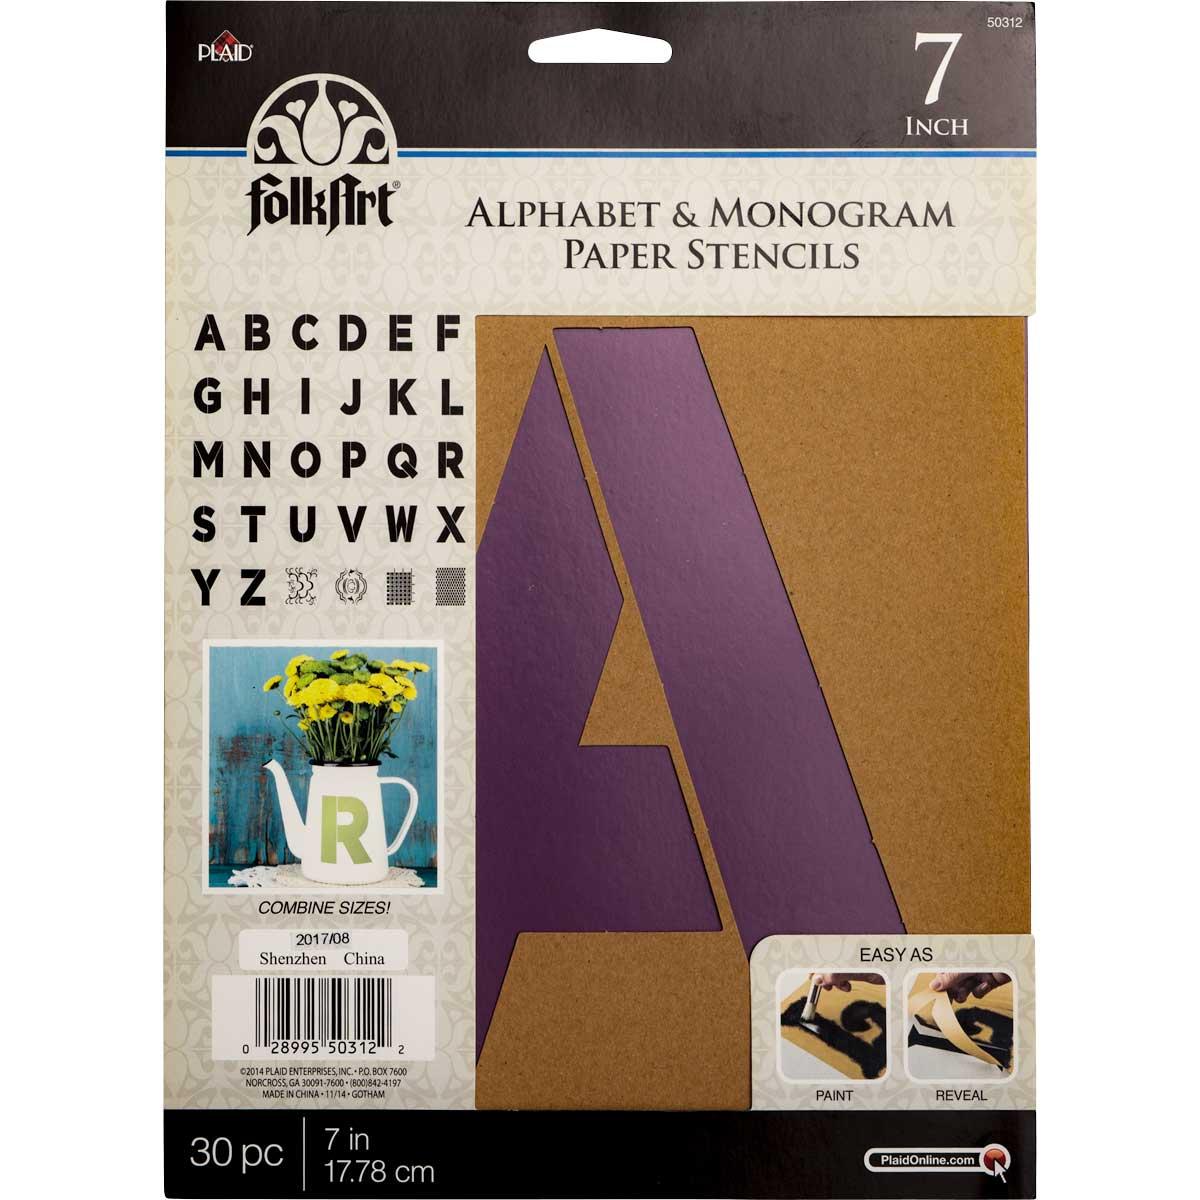 FolkArt ® Alphabet & Monogram Paper Stencils - Bold Font, 7